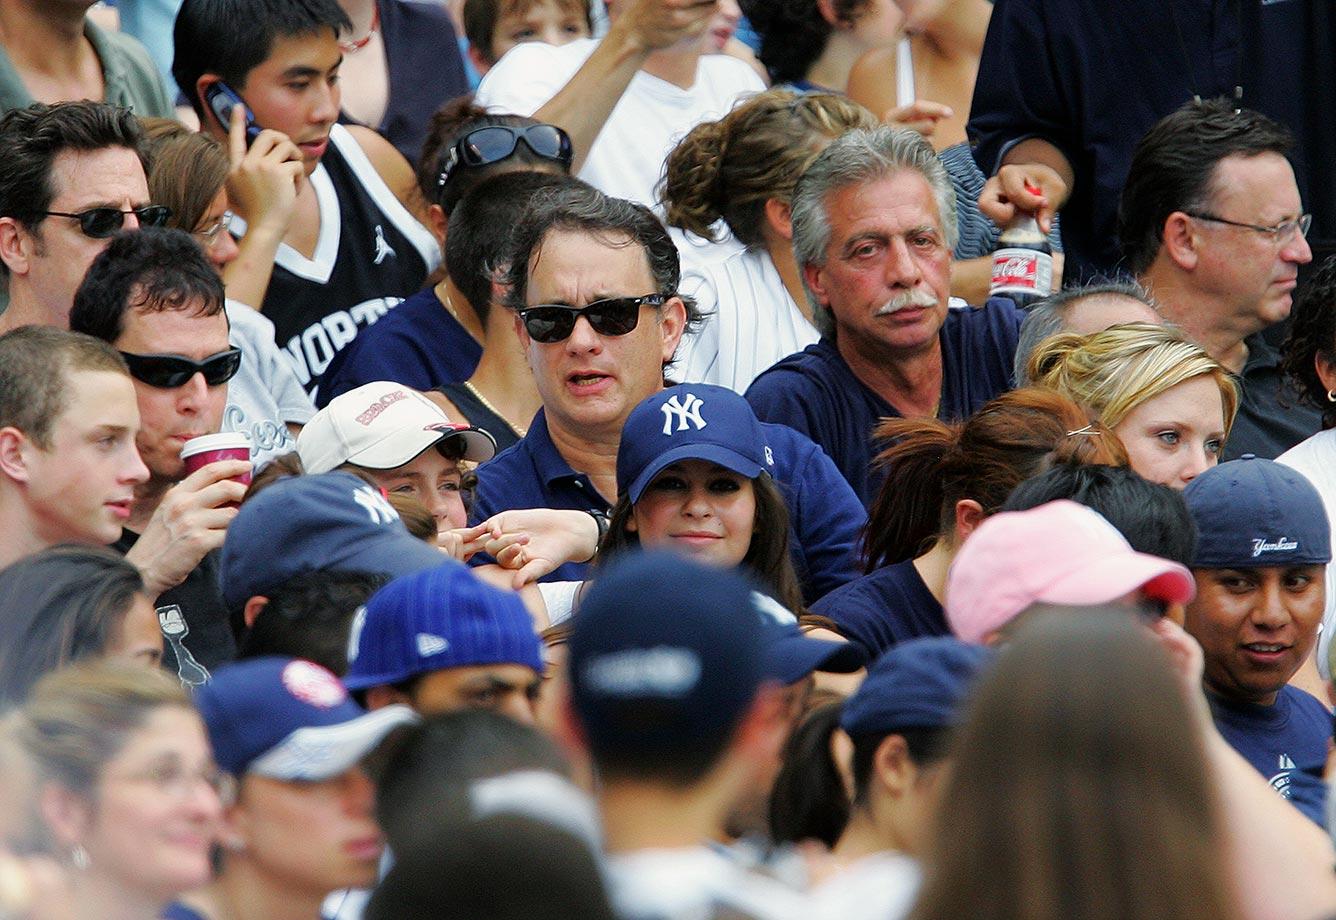 July 29, 2006: Tampa Bay Devil Rays at New York Yankees